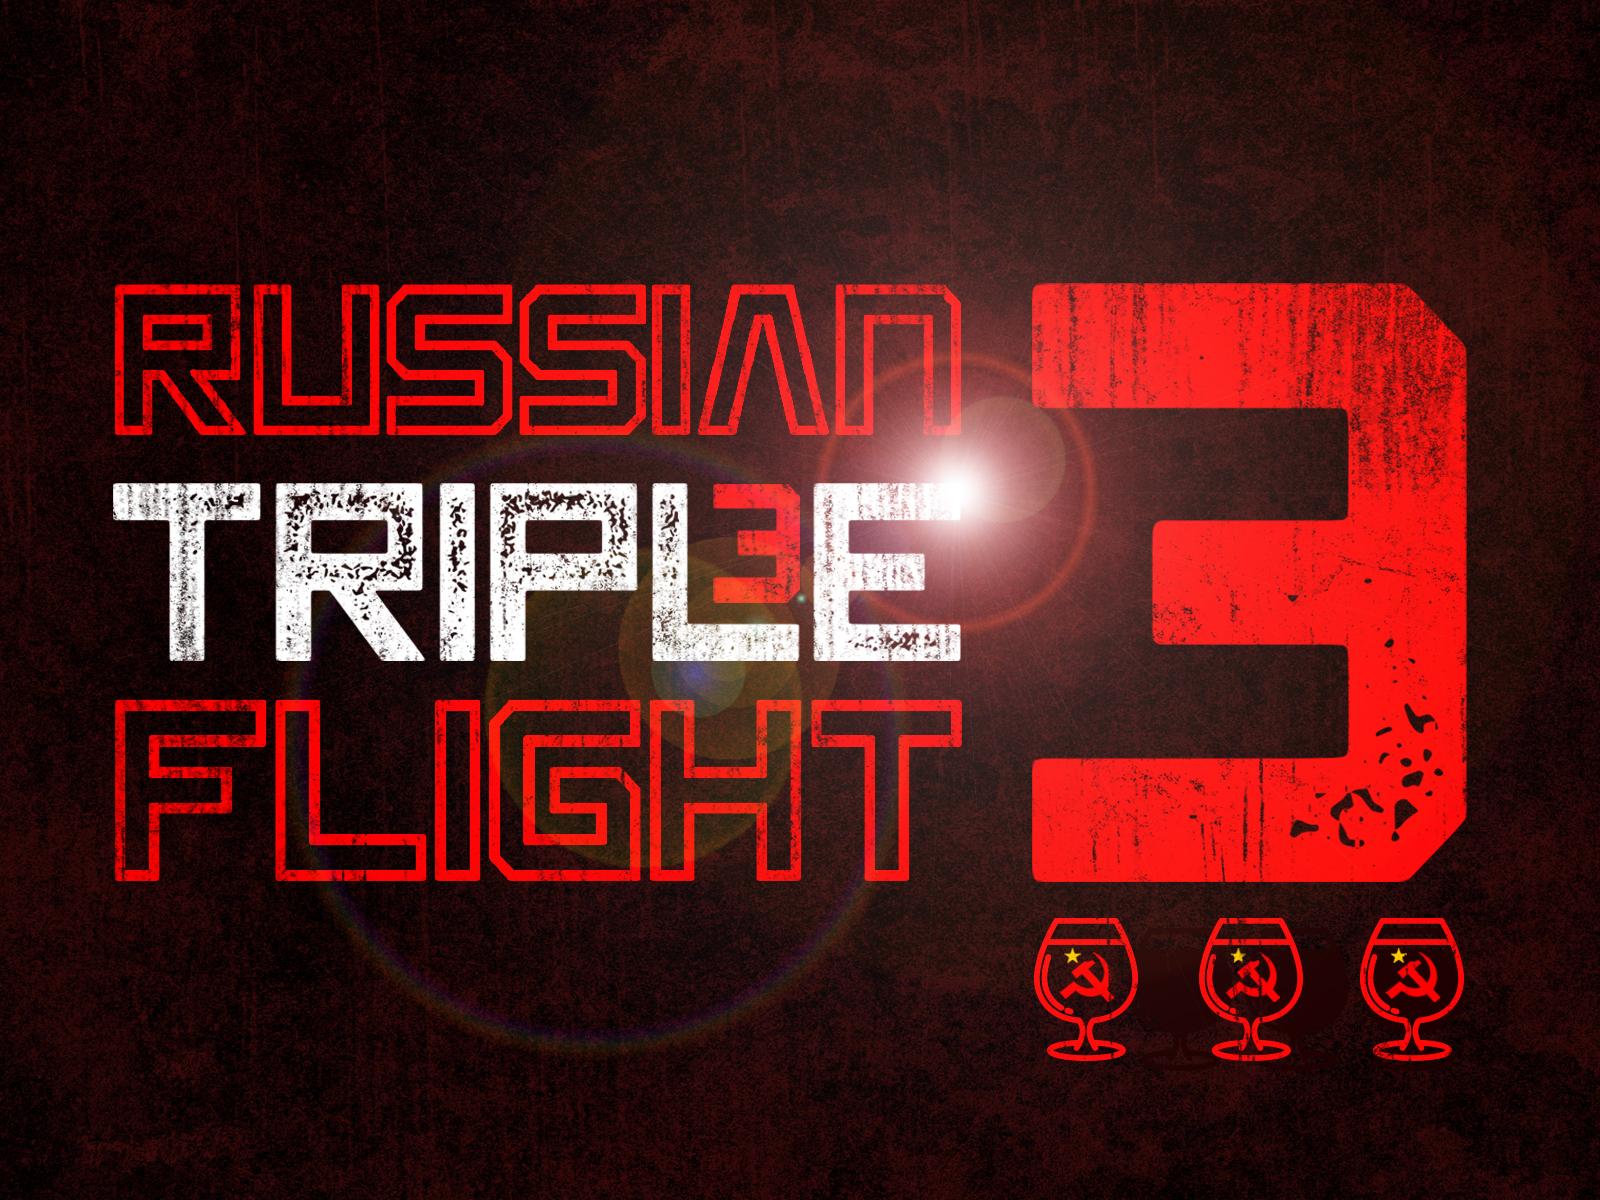 Russian Imperial Triple Flight beerflight triple imperial russian beer branding beer brewery beer art lostboroughbrewing